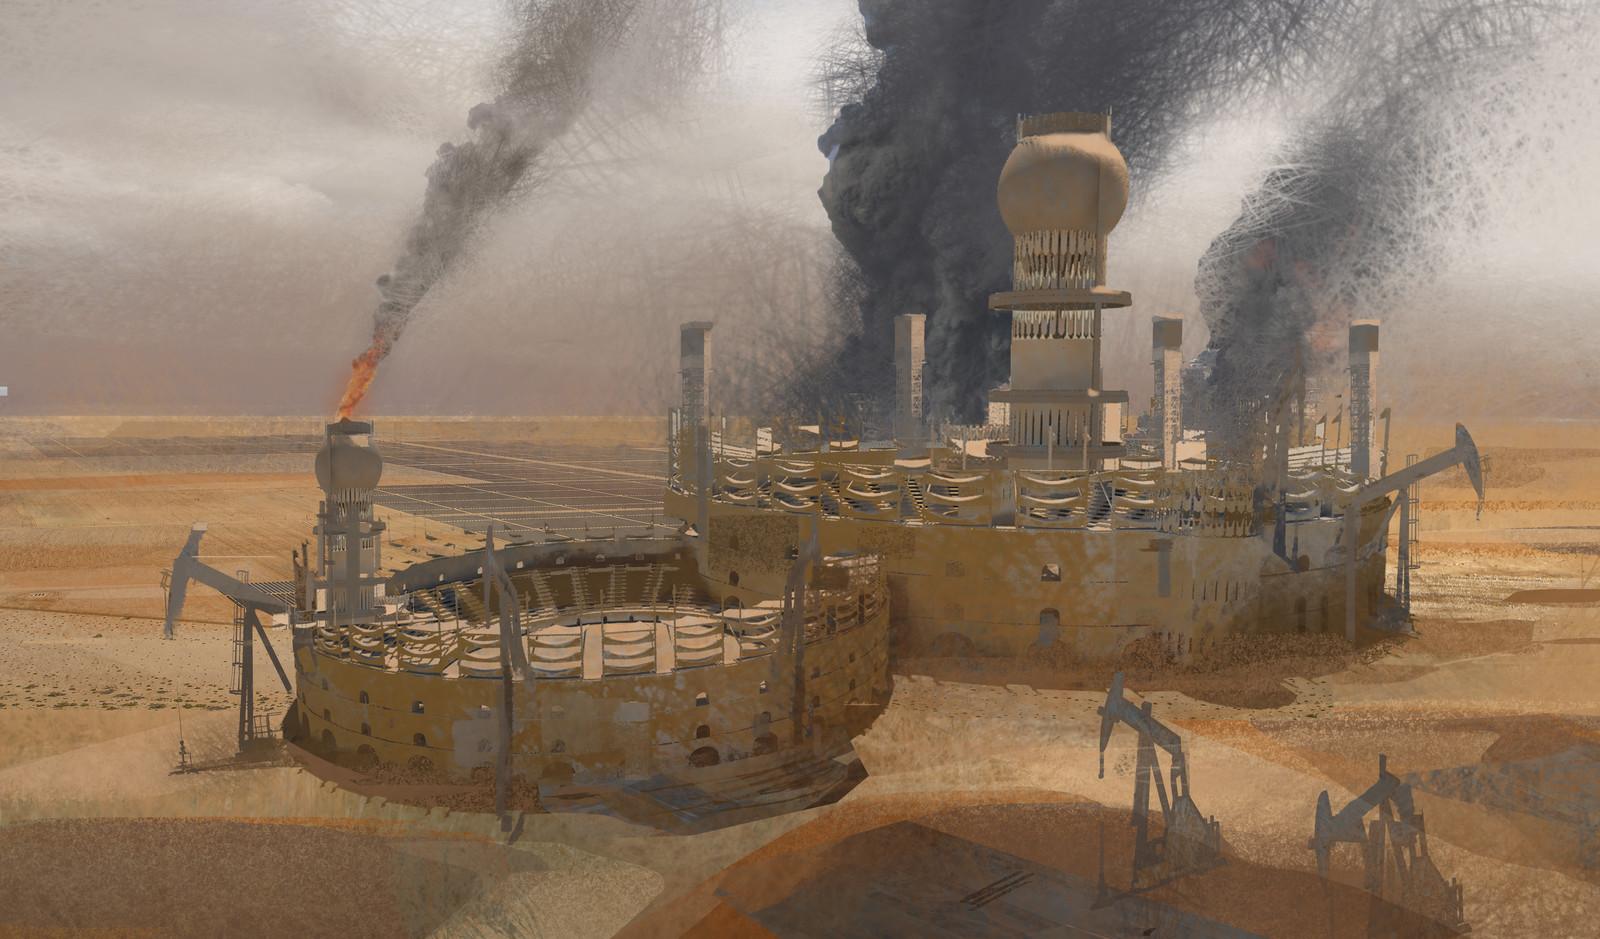 sketch1 for OilField